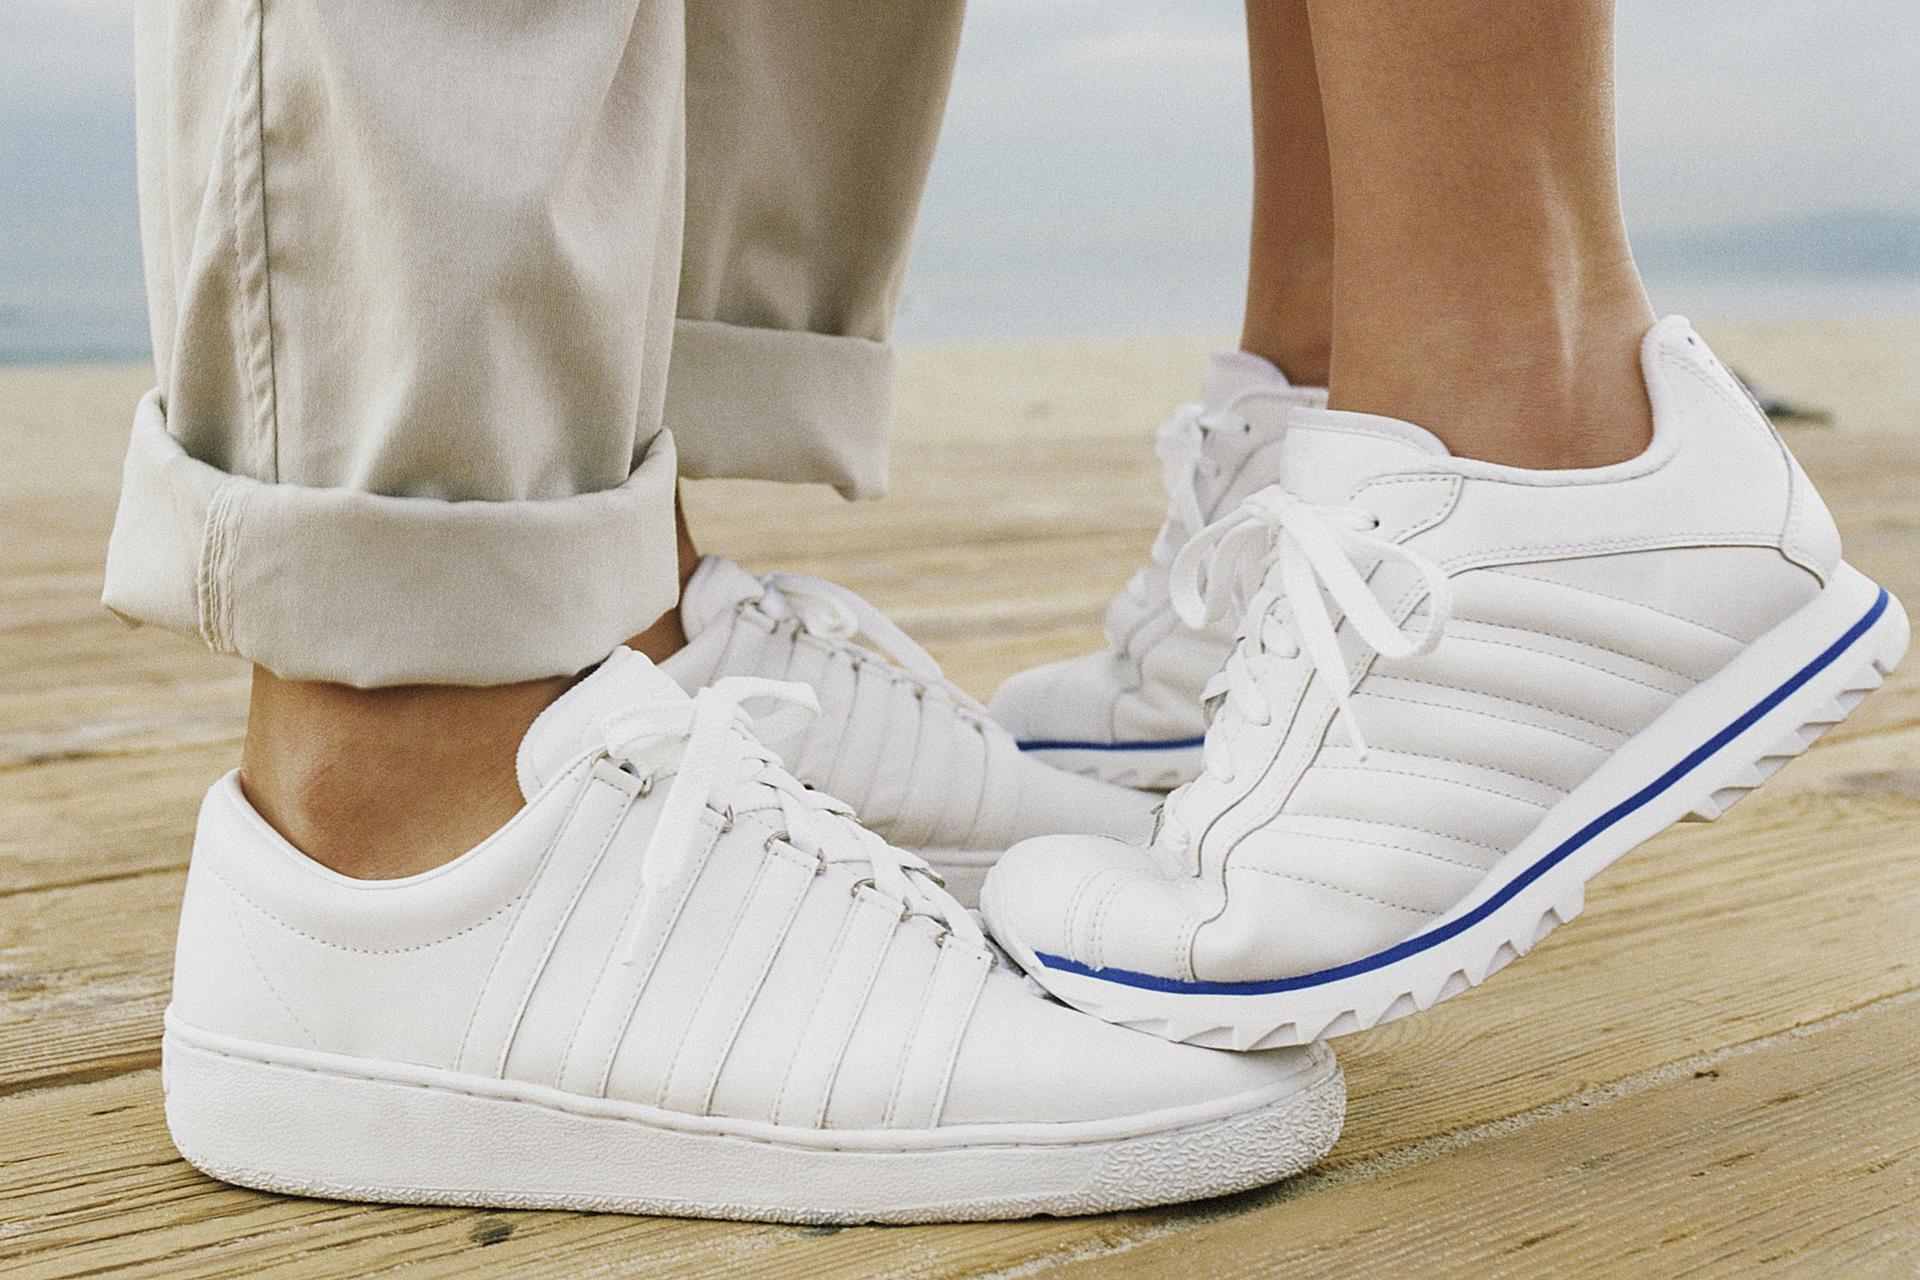 f1b1ea1bceba2 How to Convert Men s and Women s Shoe Sizes